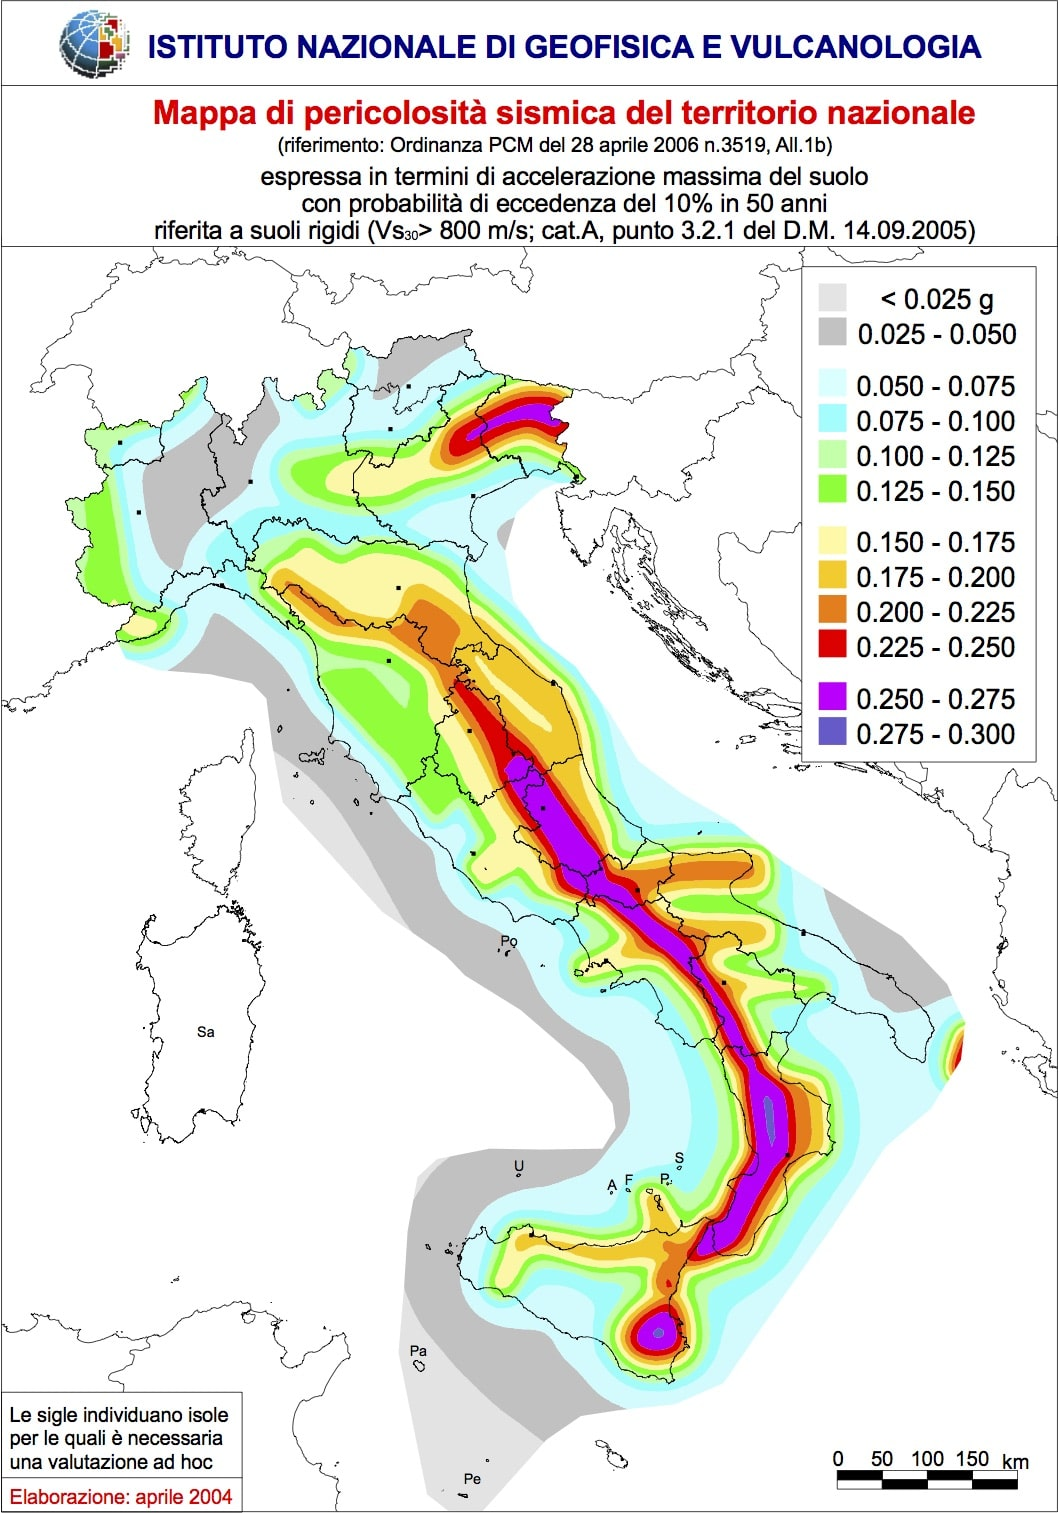 Terremoto oggi in Italia 23 gennaio 2020: scossa di magnitud